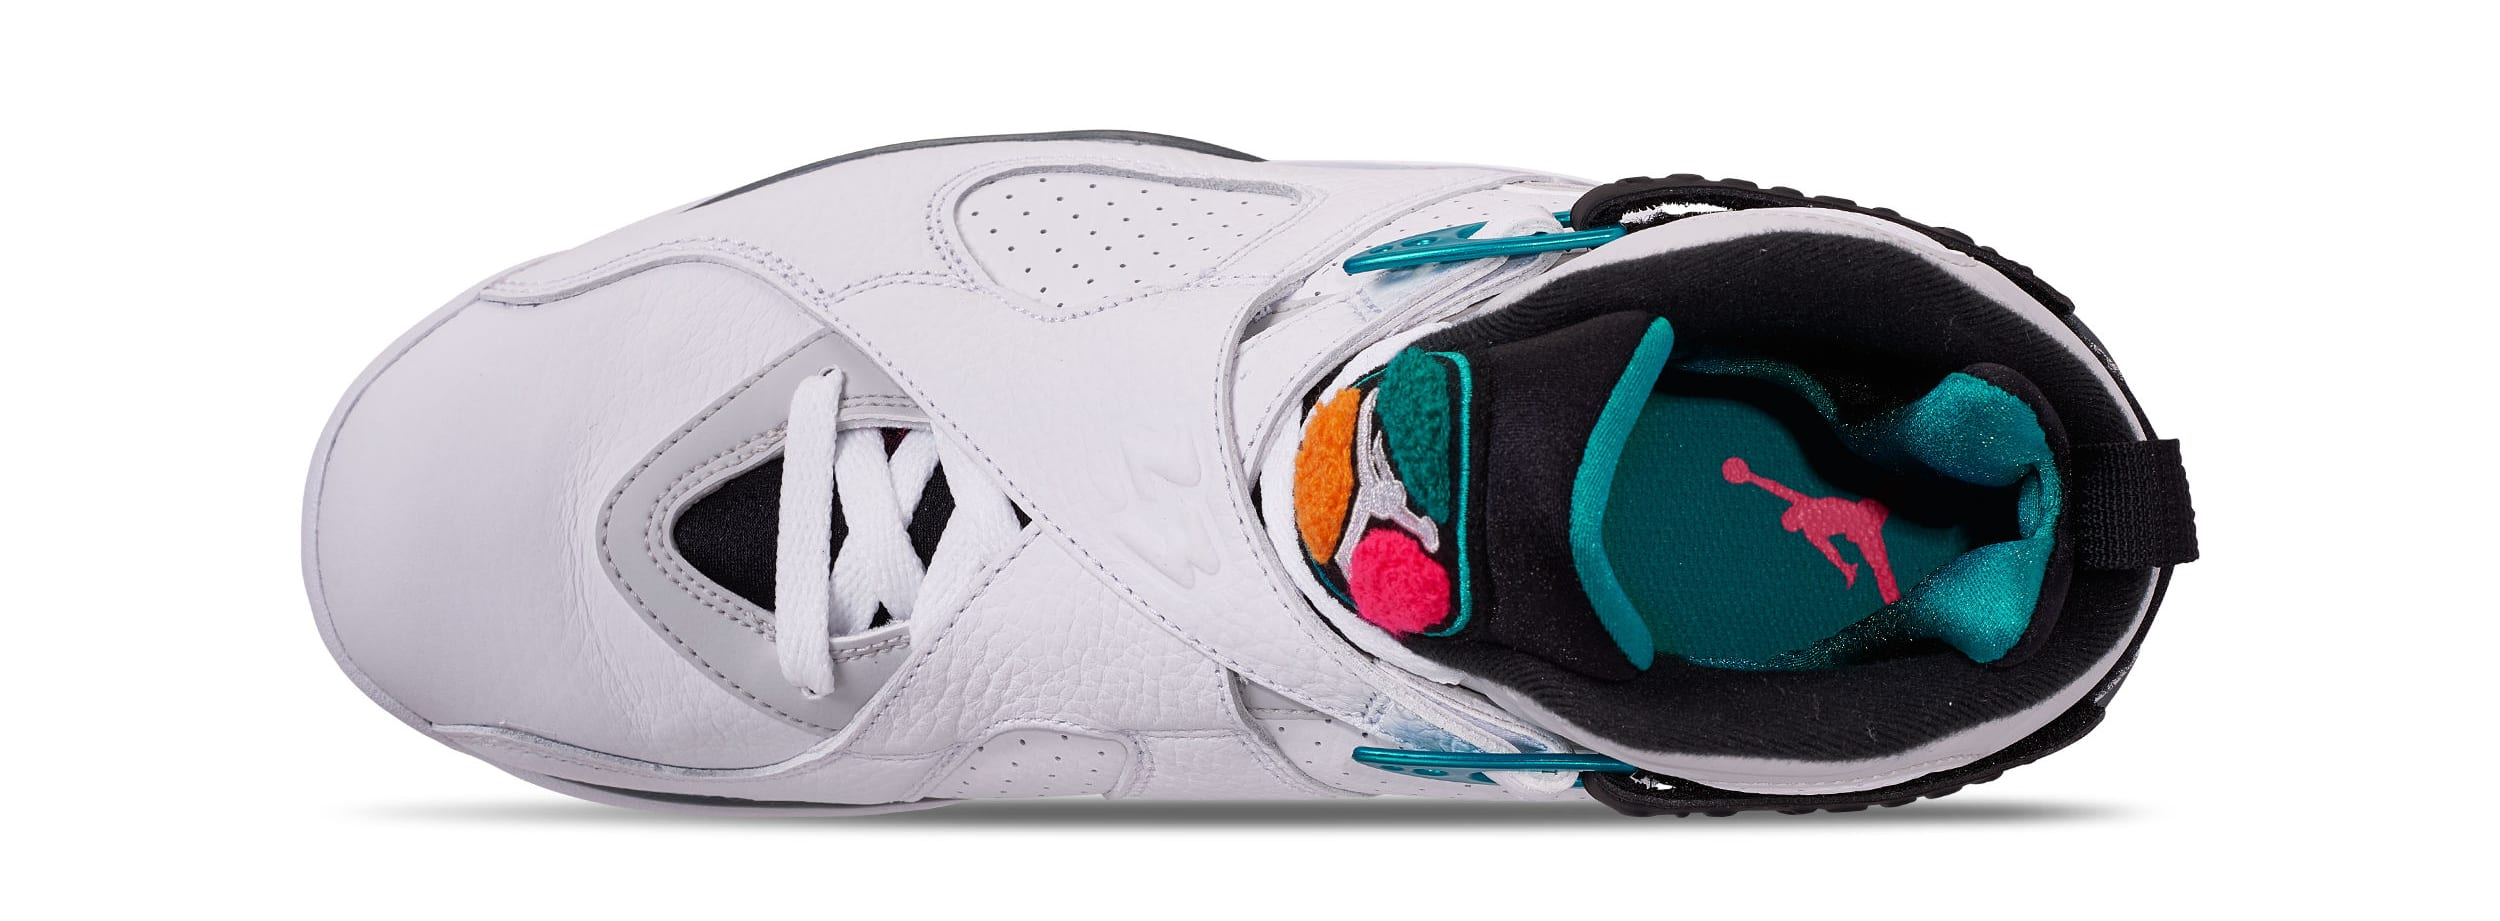 70f41a42a31eee wholesale air jordan 11 mens shoes aaa black green online 71504 8b07c   coupon code for image via finish line air jordan 8 south beach 305381 113  top 80092